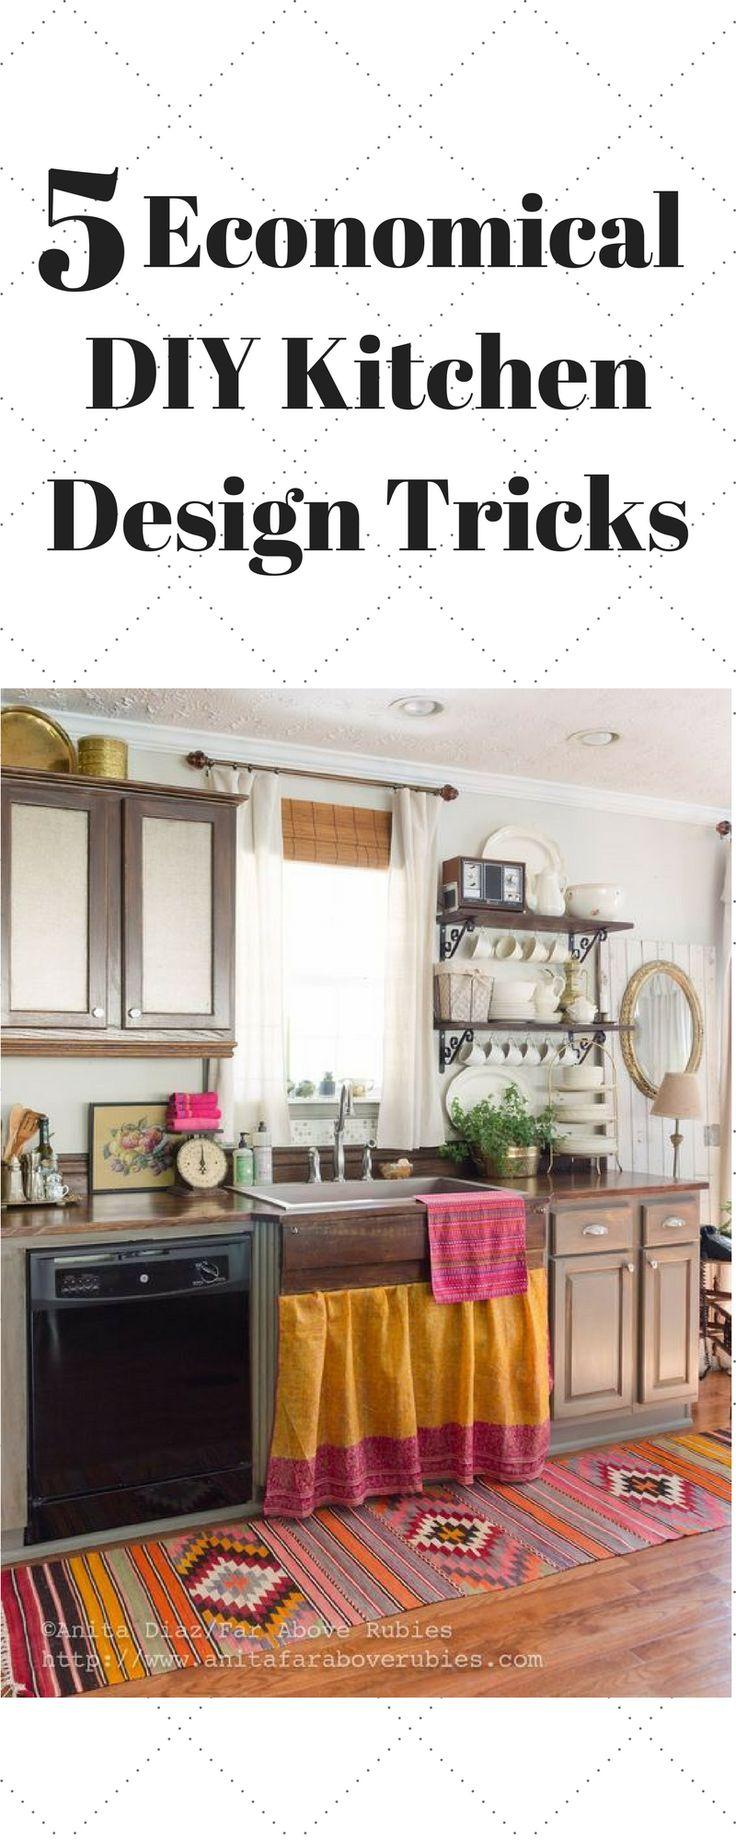 Spectacular  Economical DIY Kitchen Design Tricks kitchen ideas kitchen design kitchen island